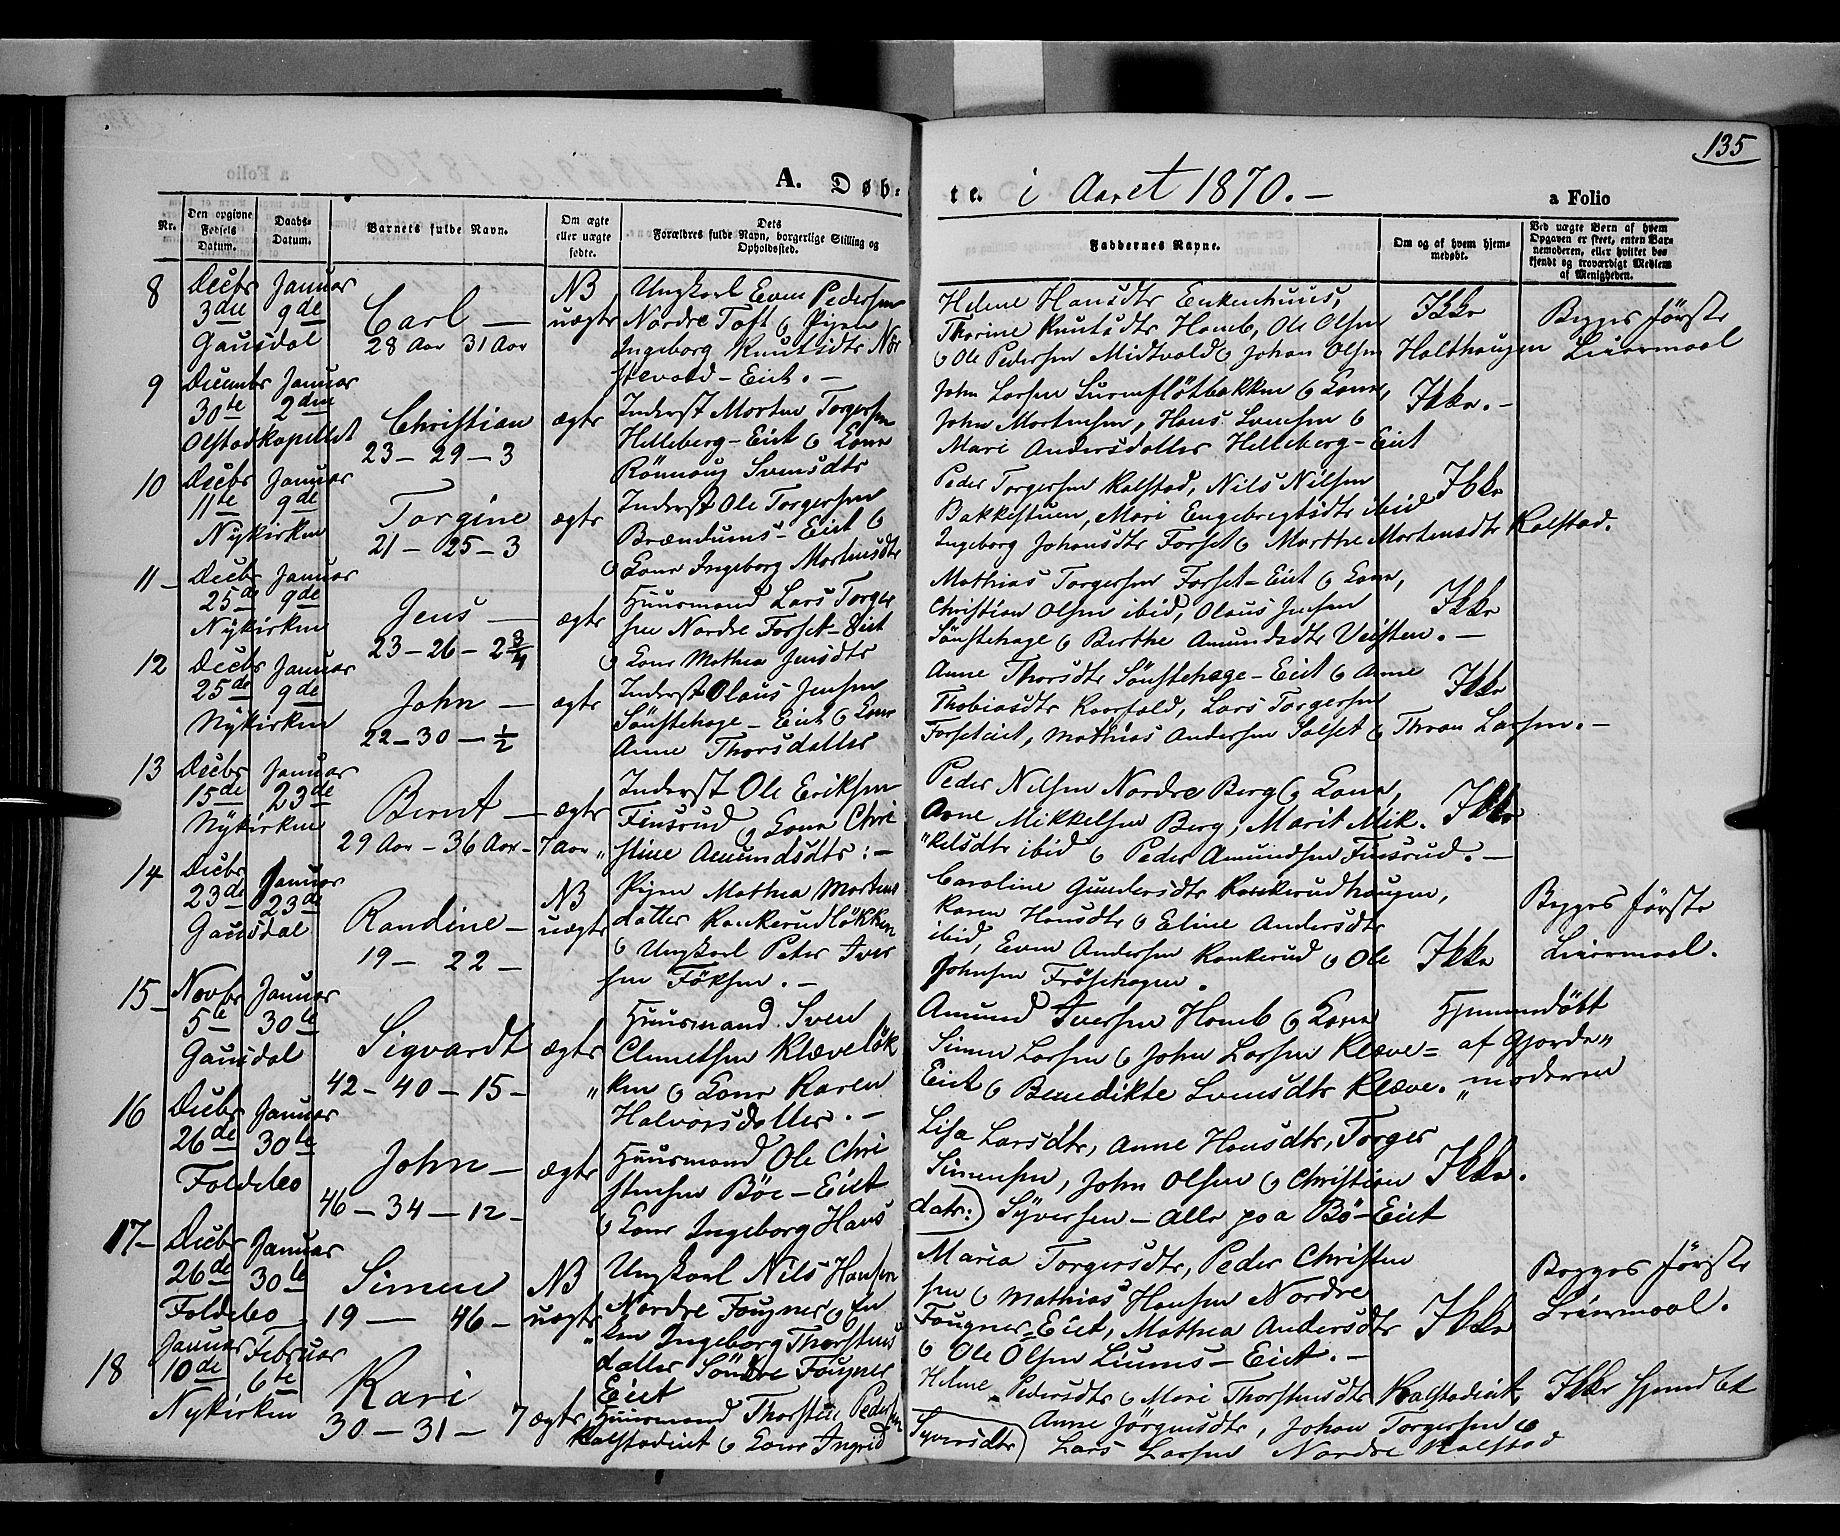 SAH, Gausdal prestekontor, Ministerialbok nr. 9, 1862-1873, s. 135